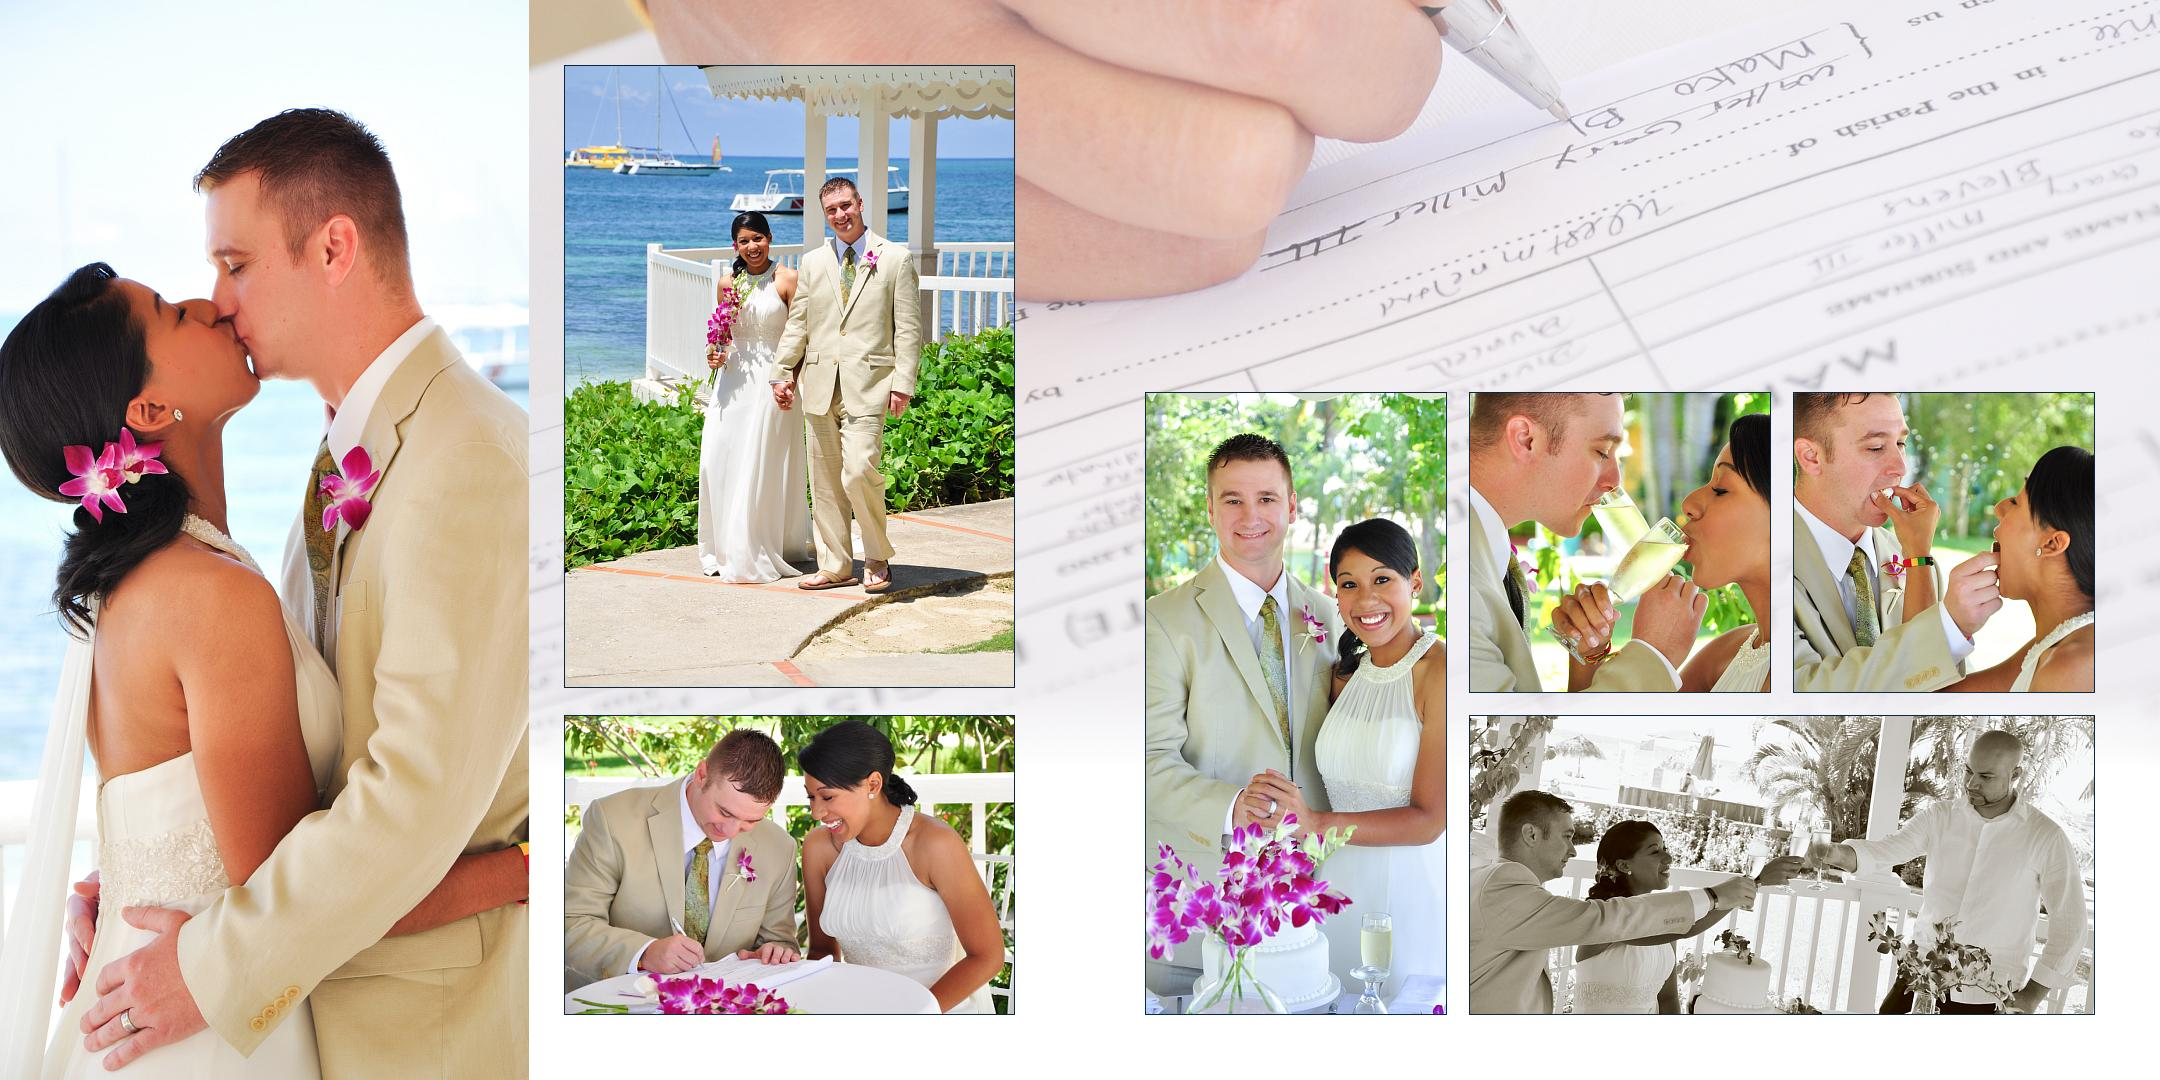 Wedding Photos by Tom Schmidt Chicago (40)